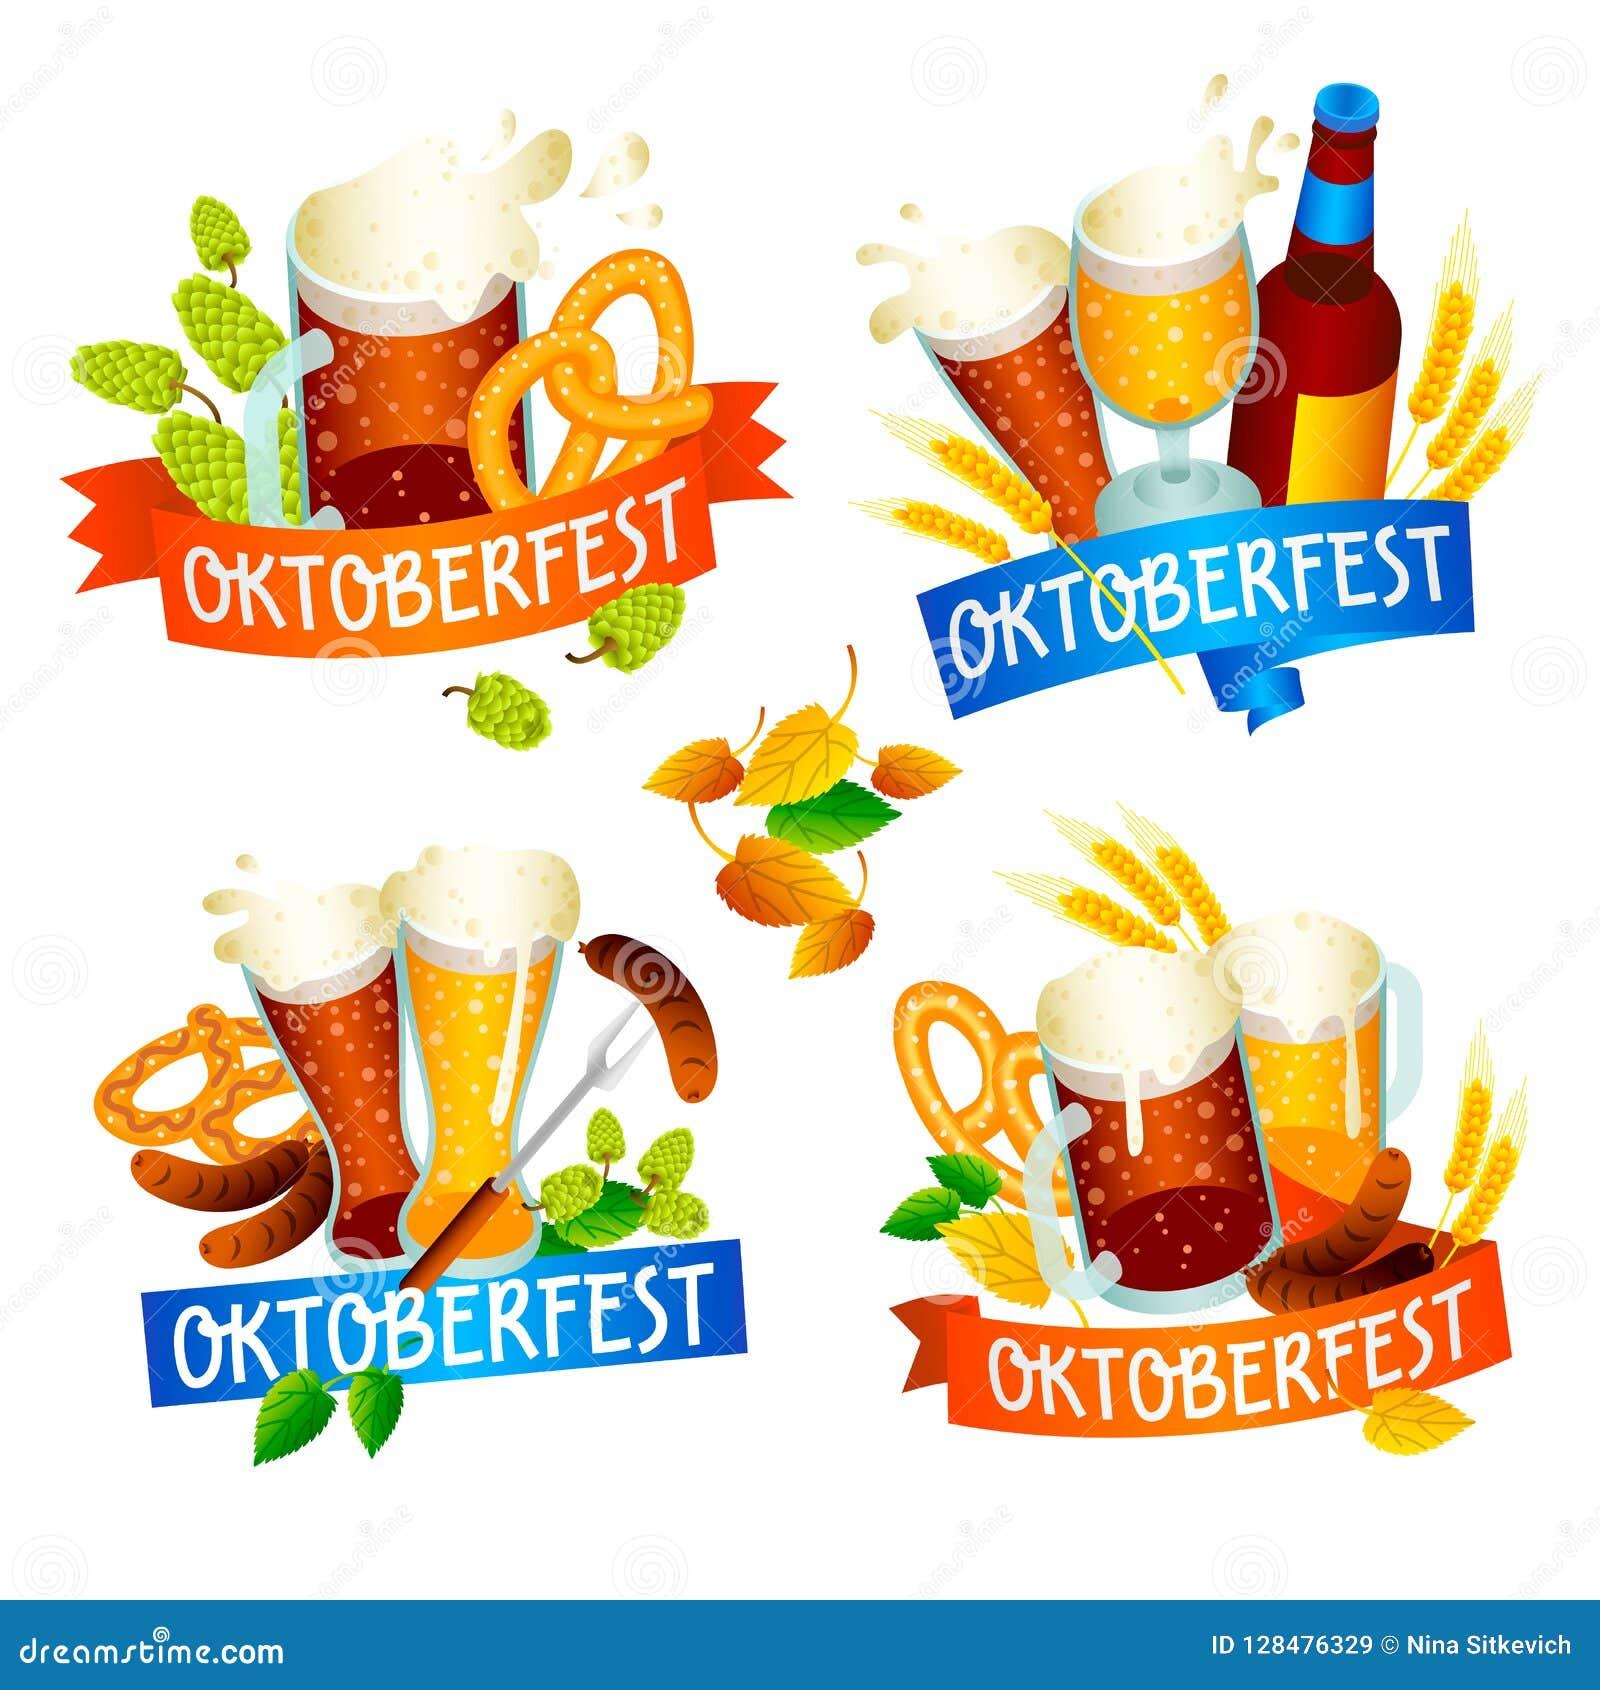 Oktoberfest-Fahnensatz, isometrische Art